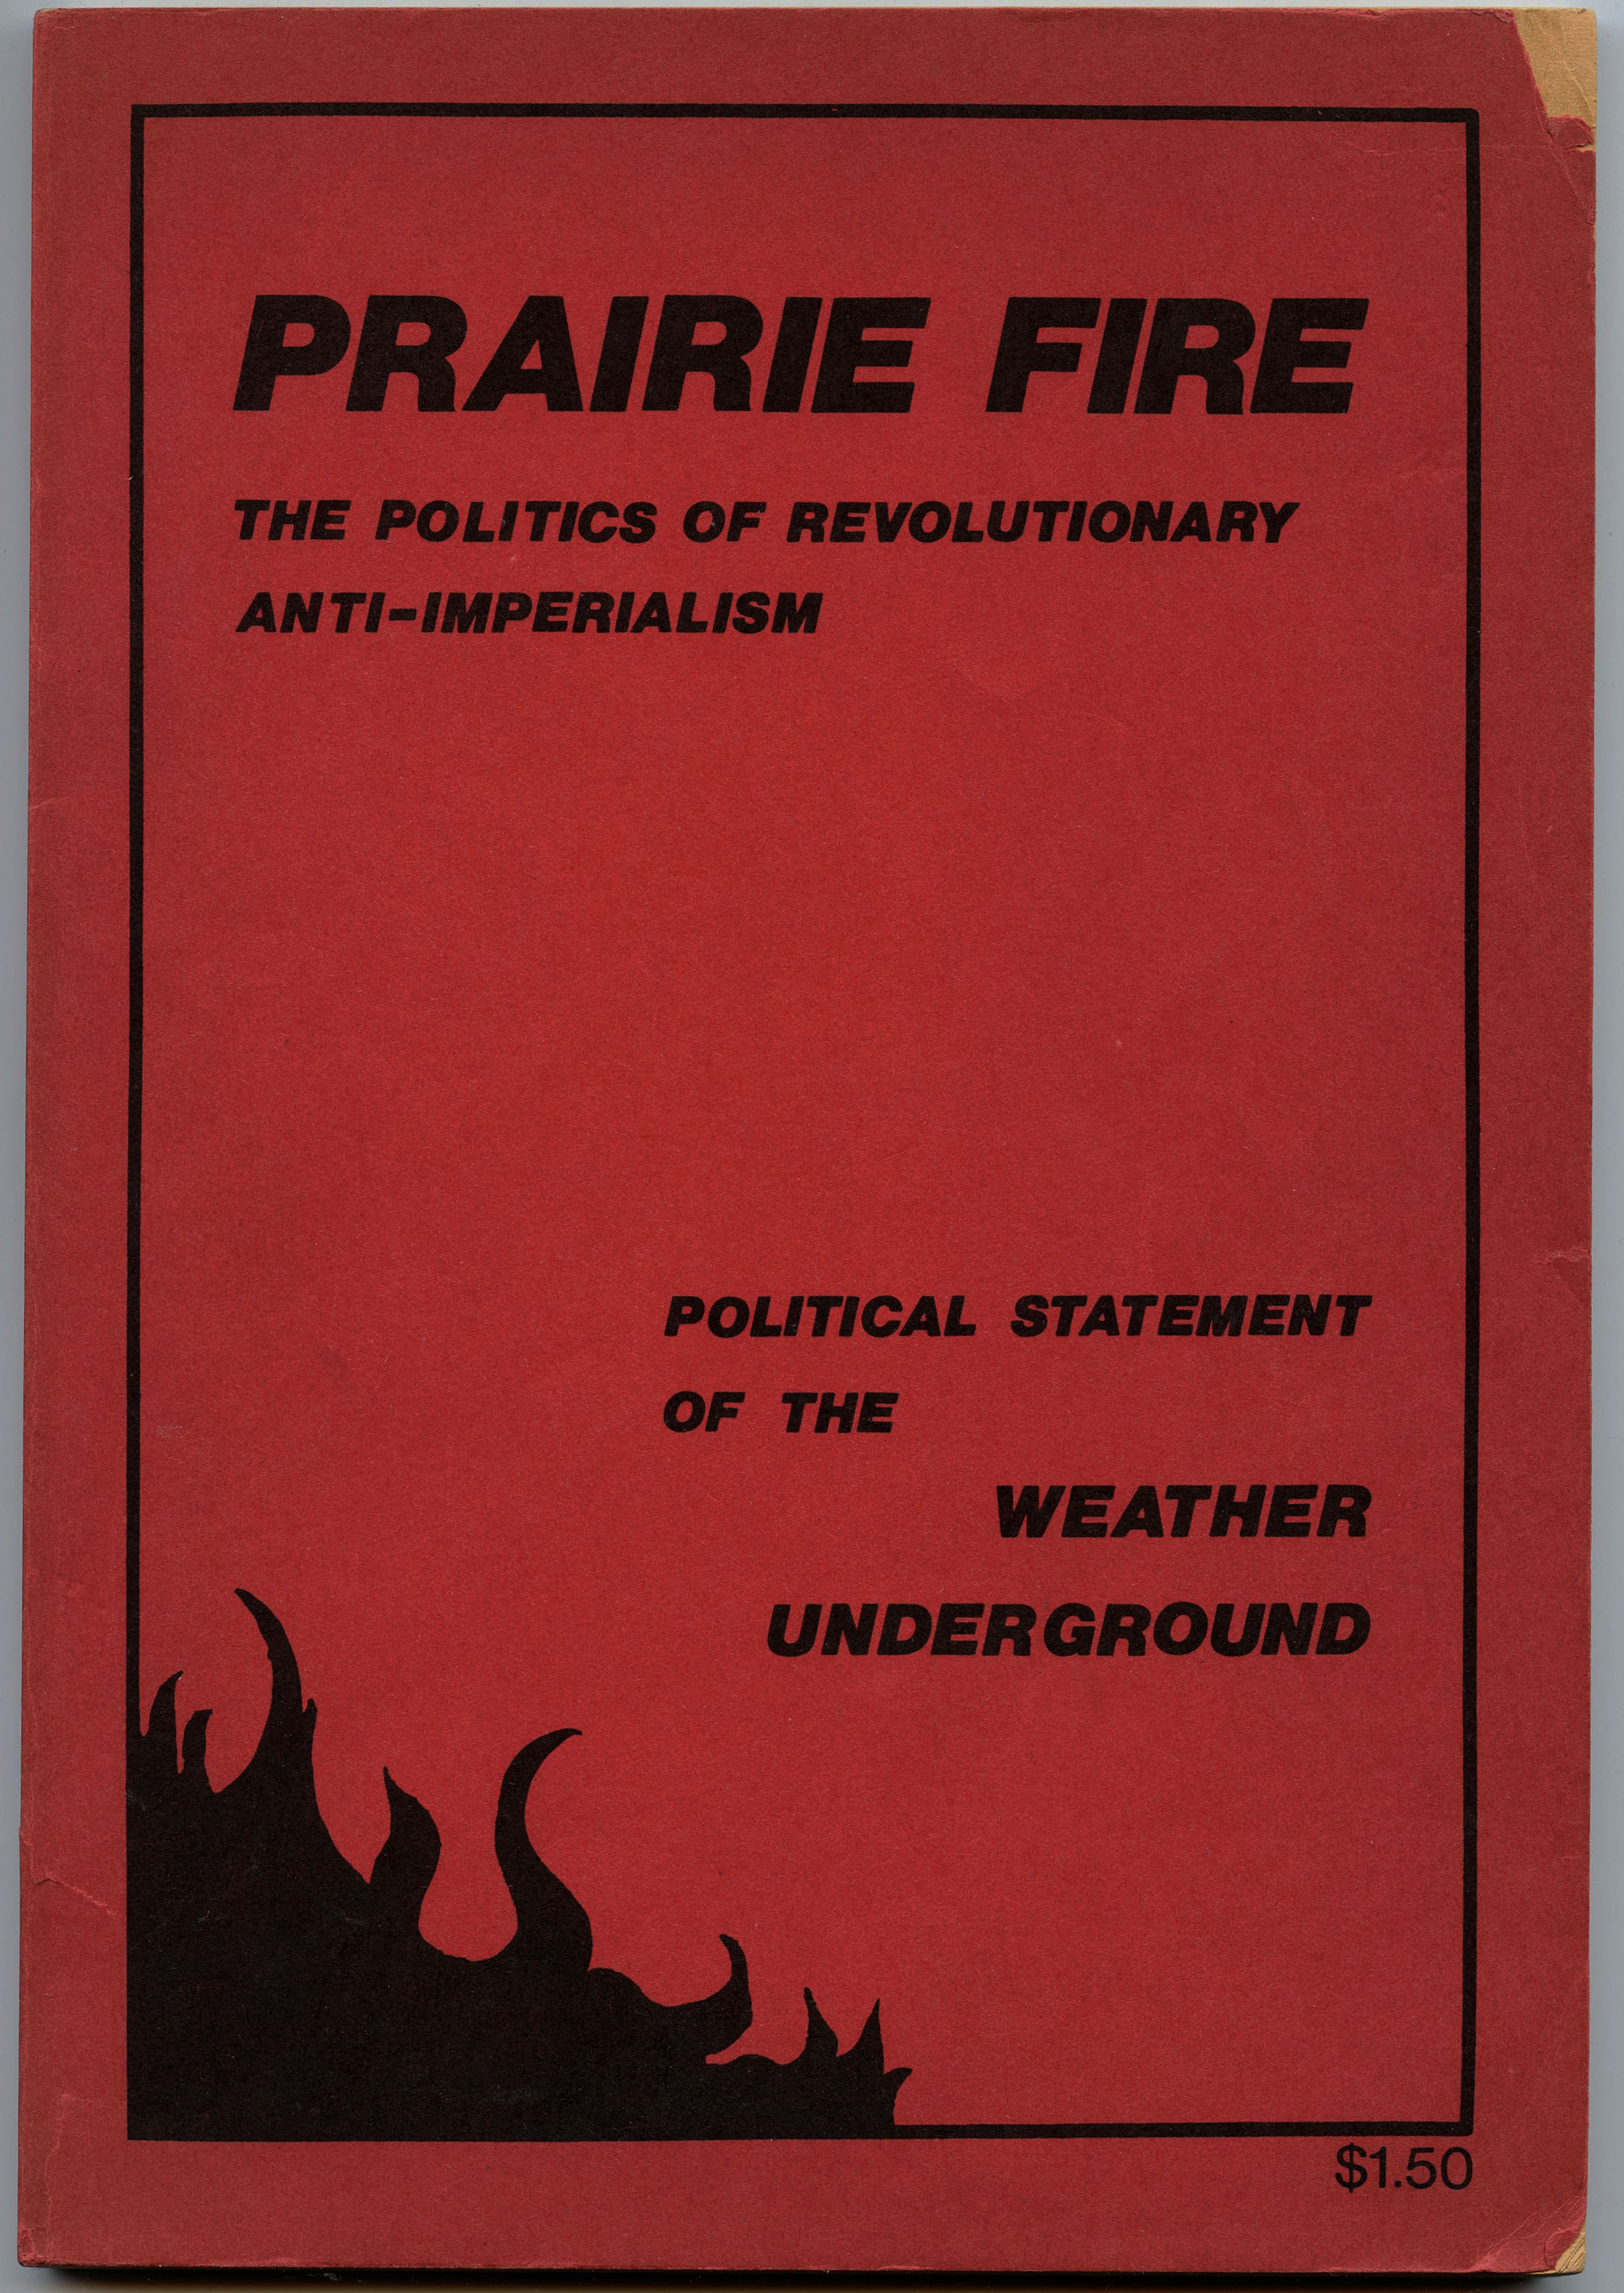 Prairie Fire: The Politics of Revolutionary Anti-Imperialism